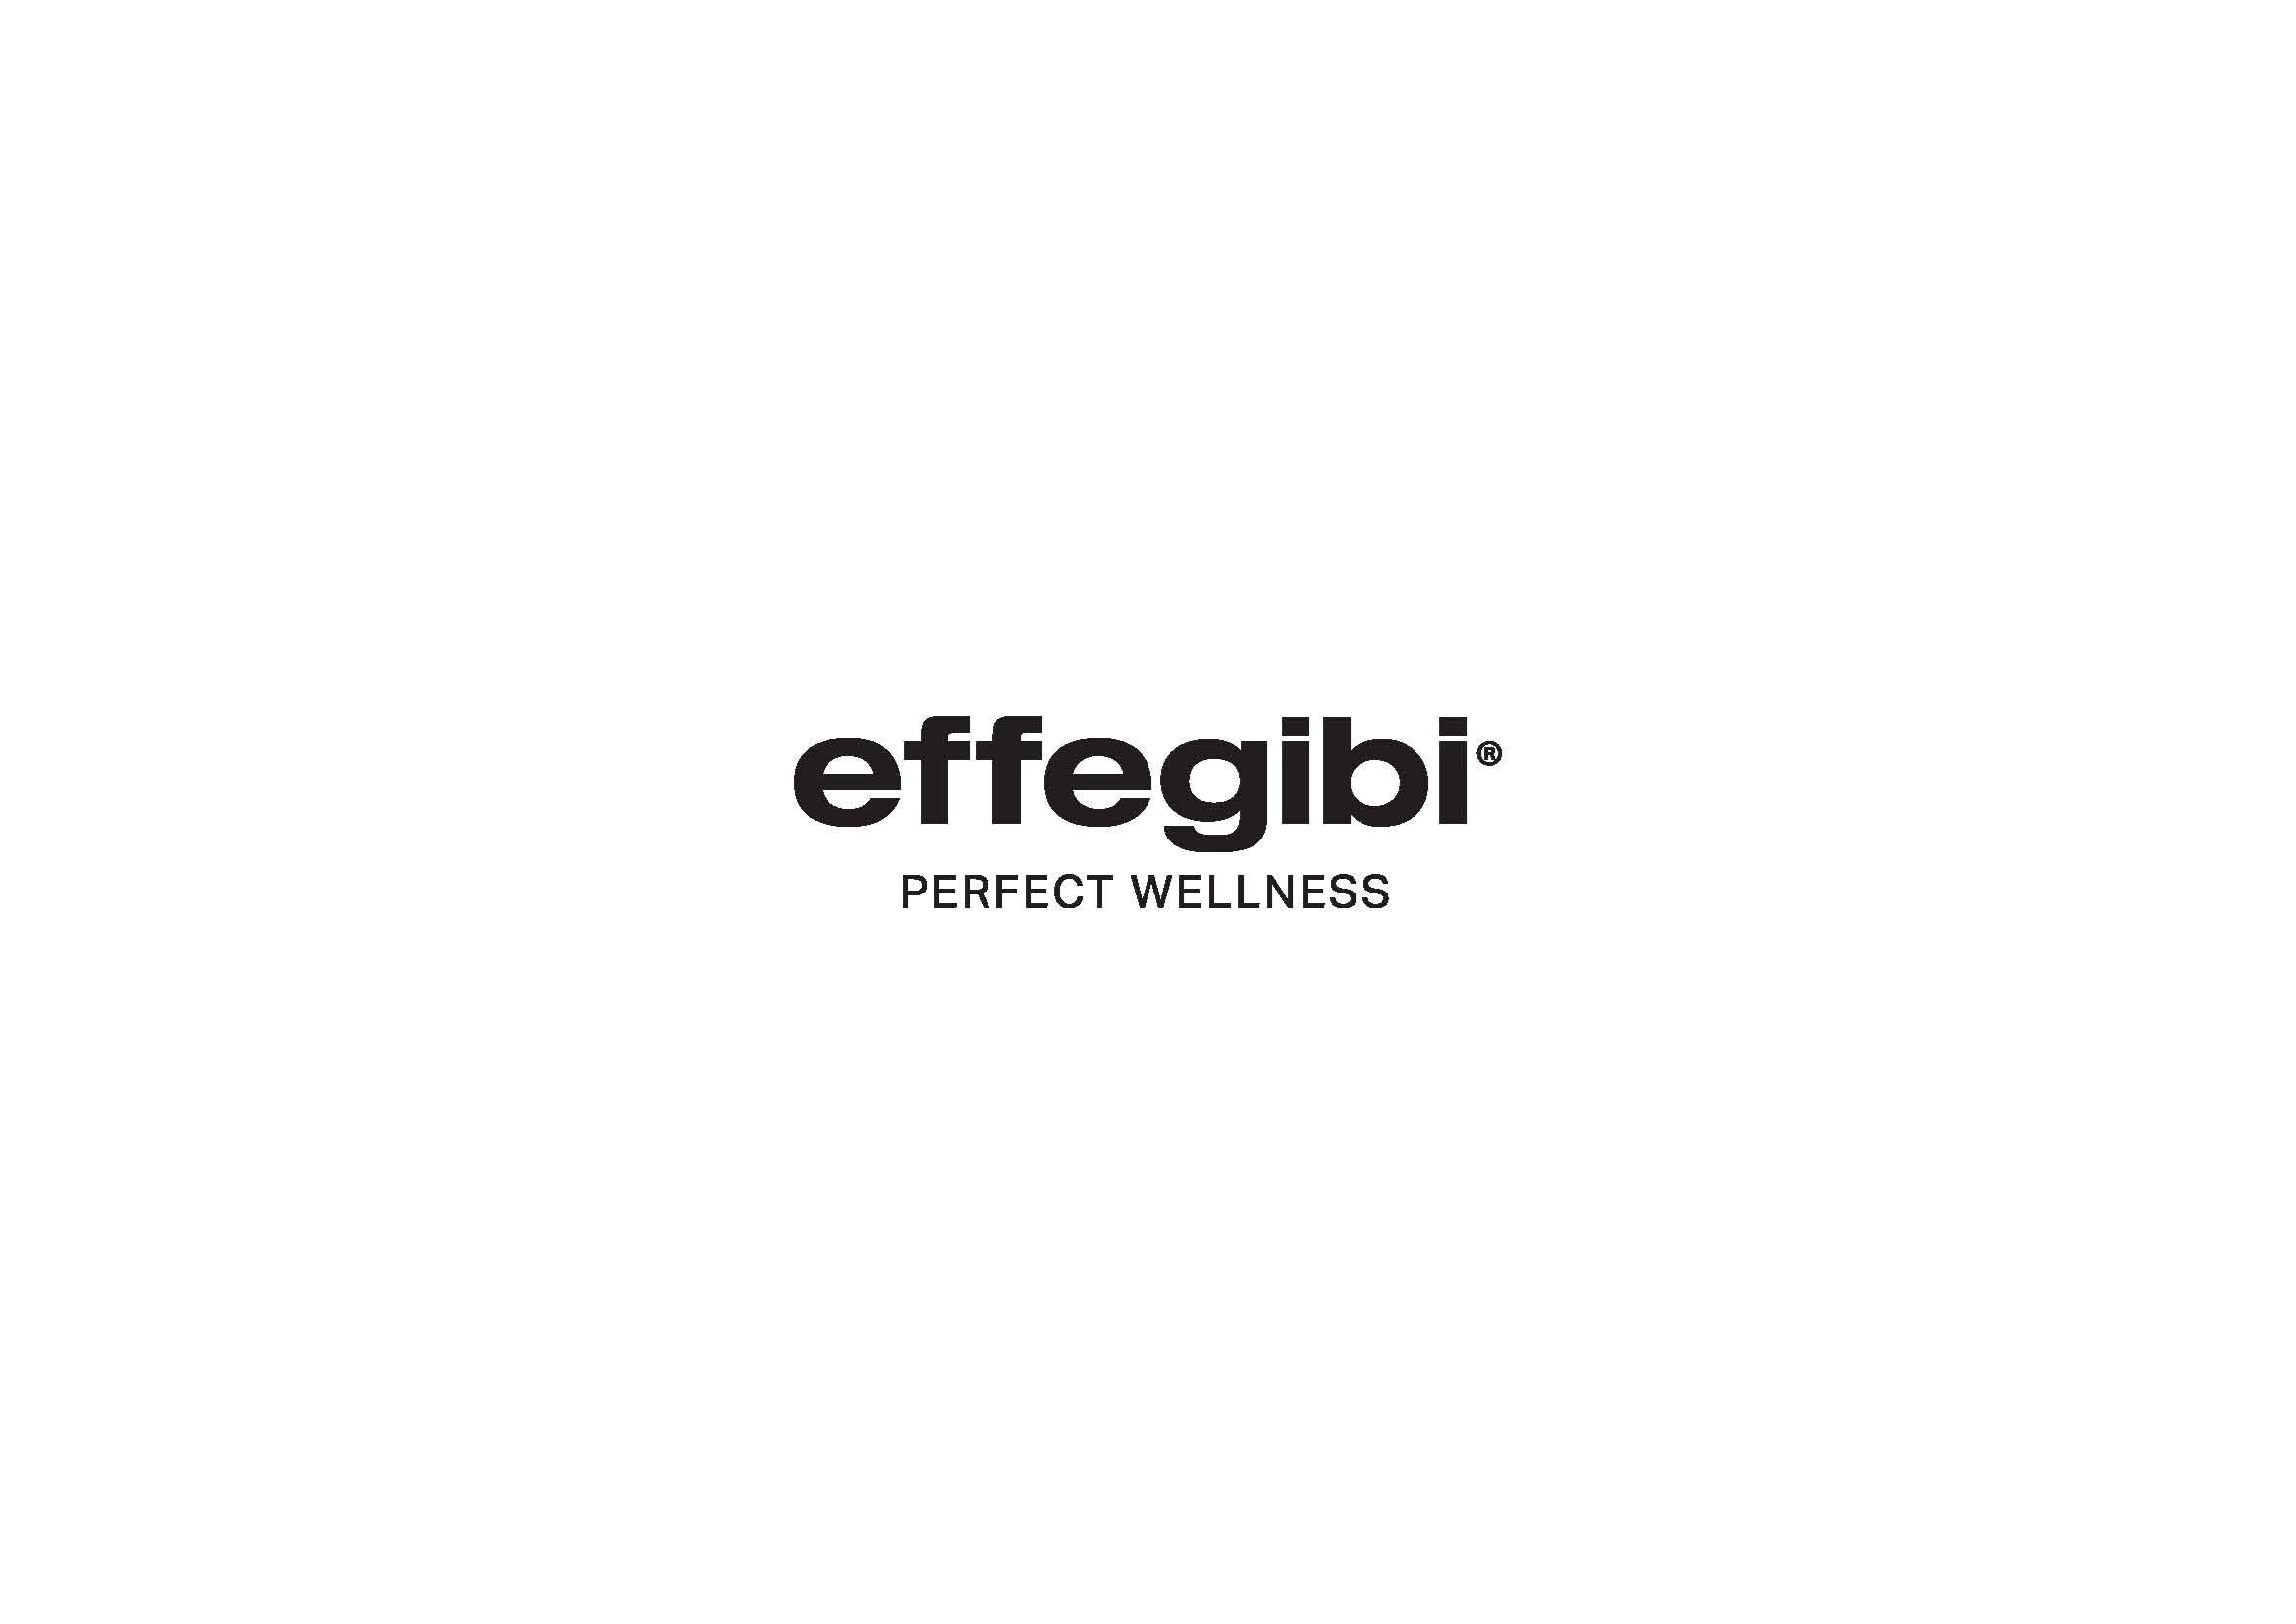 Effegibi Perfect Wellness